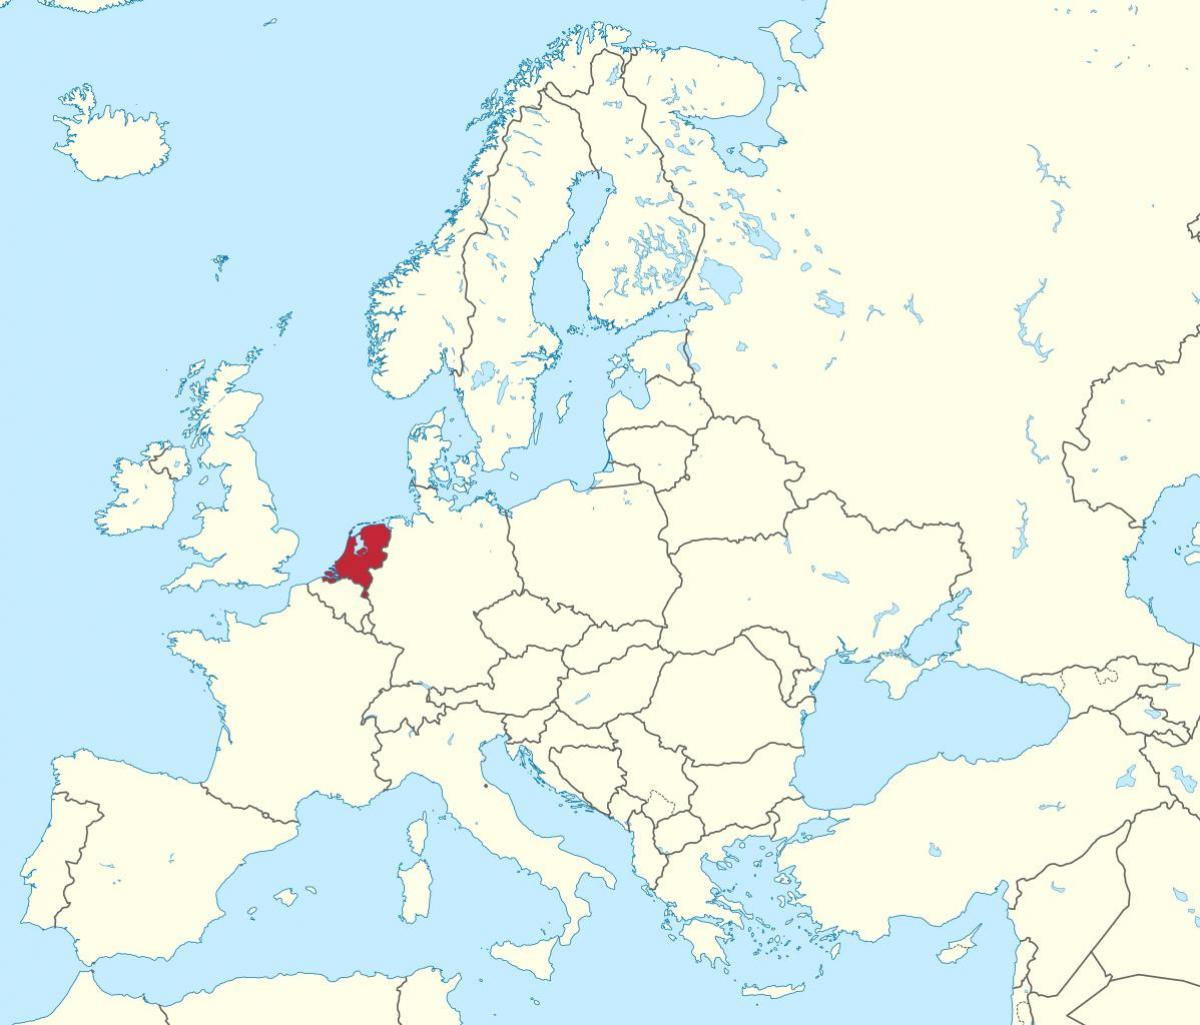 nederland kart Europa kart nederland   Nederland kart europa (Vest Europa   Europa) nederland kart